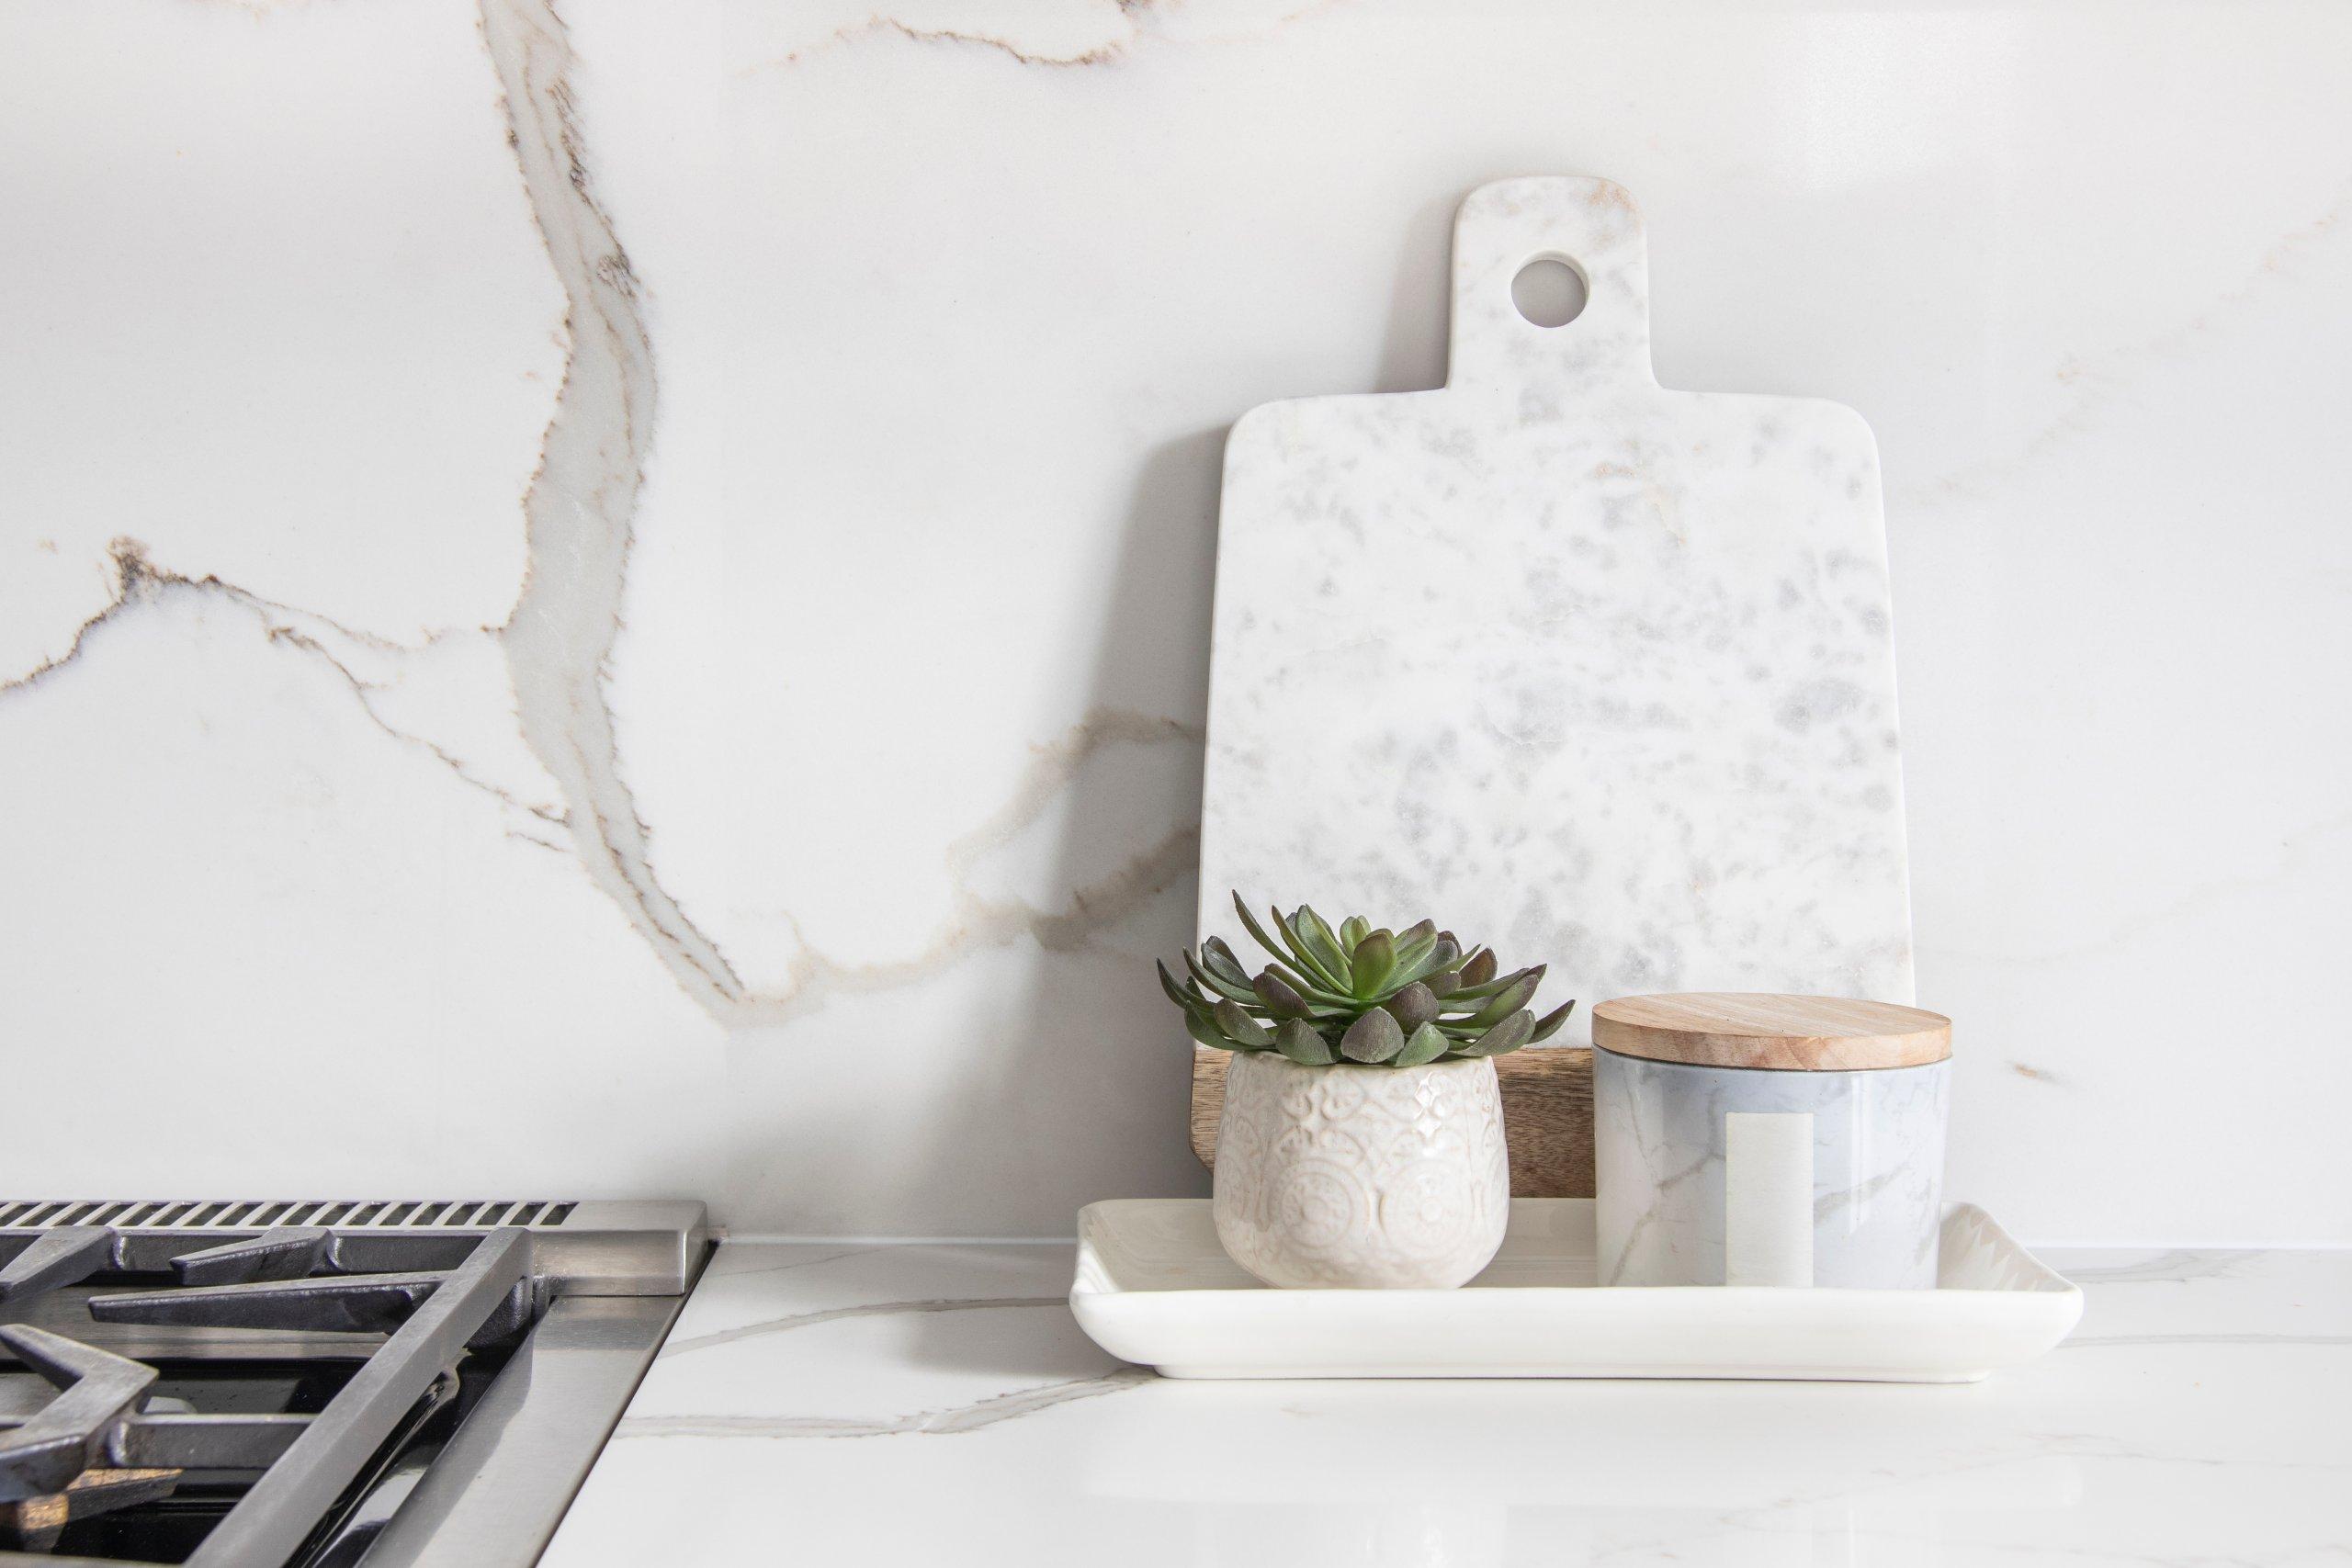 Marble kitchen backsplash and counter